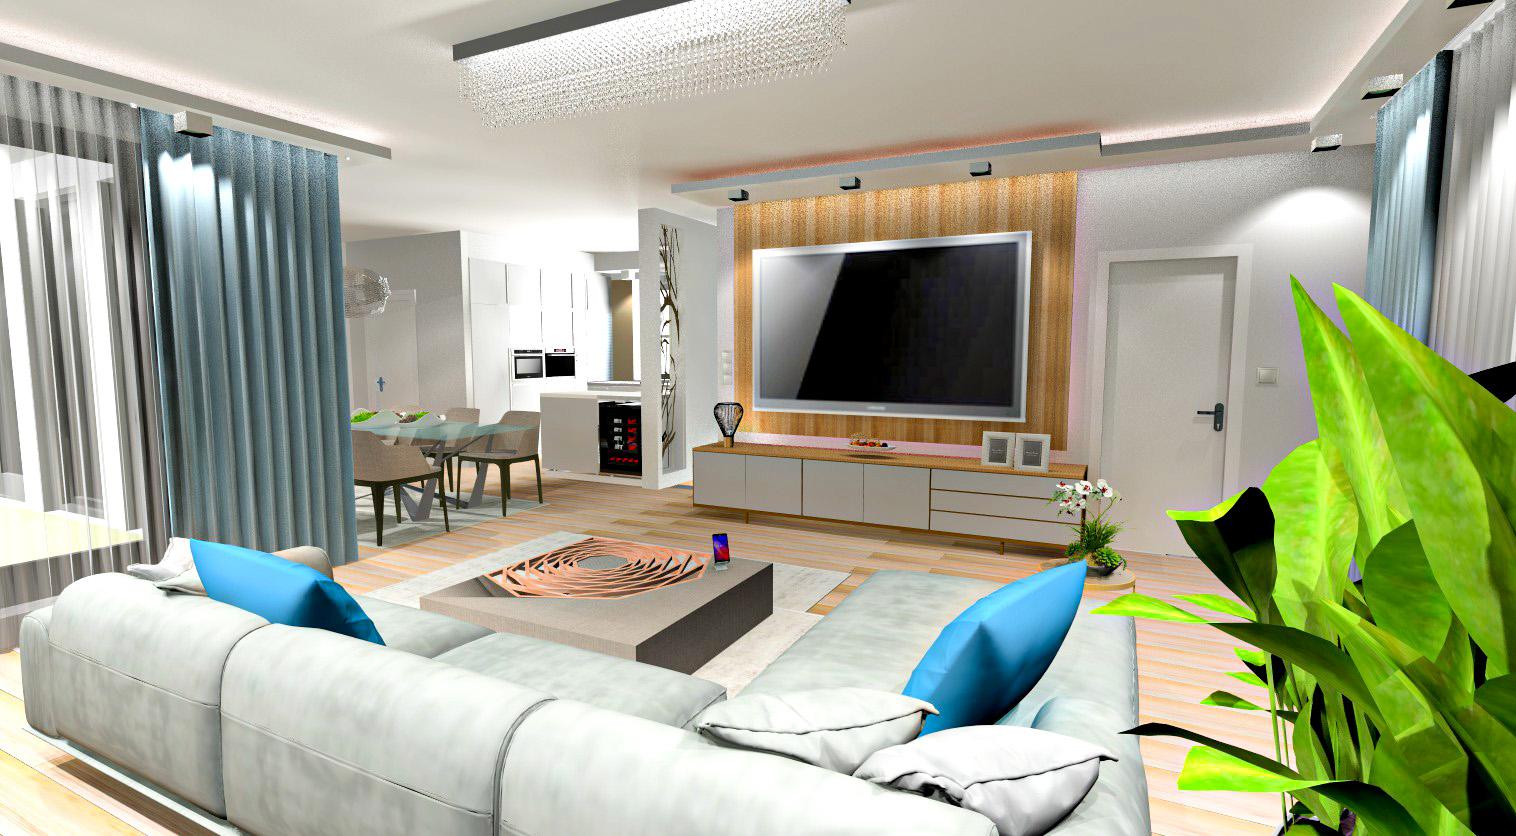 Magas utca 145 TV nézet (1)